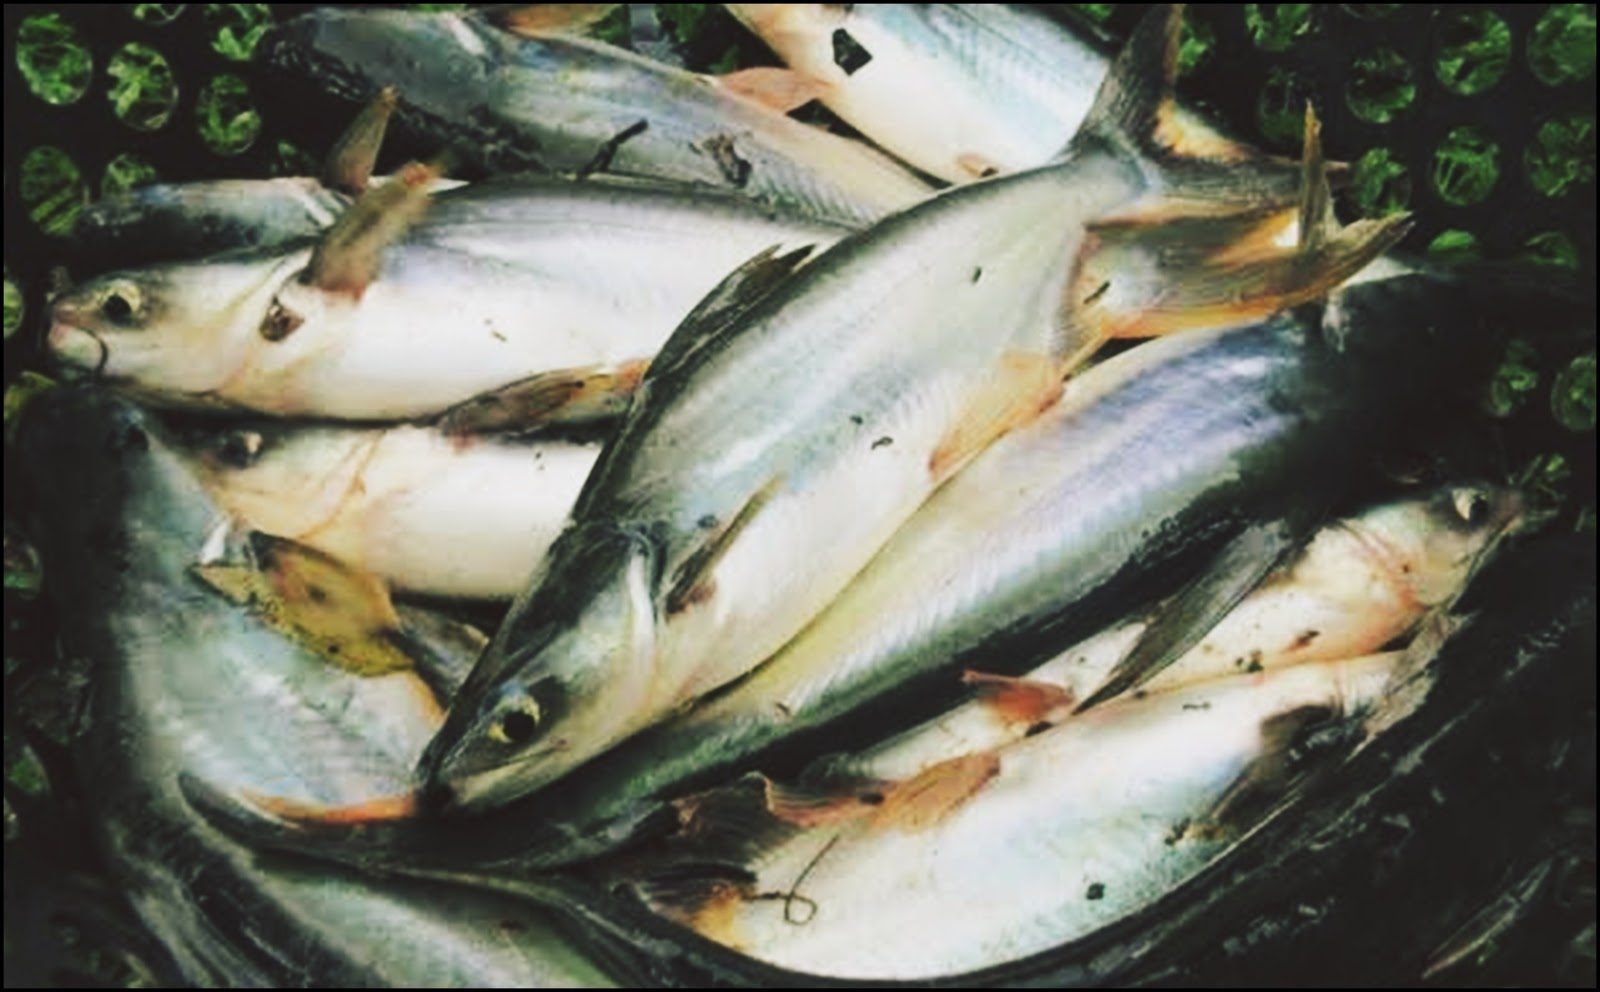 Supplier Jual Ikan Patin di Jogja 2020